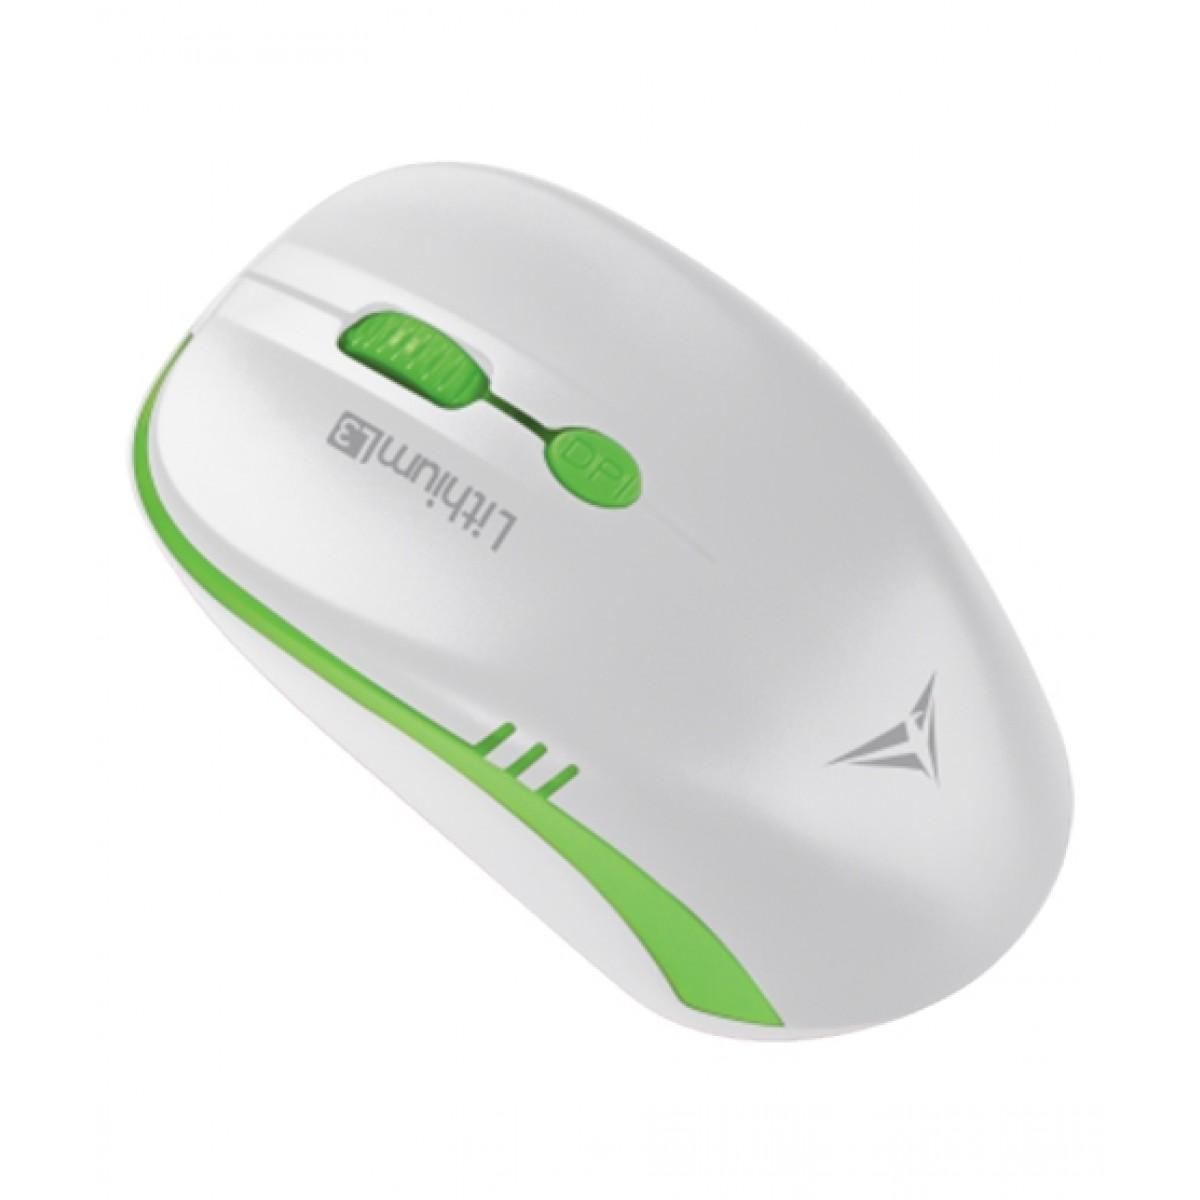 Alcatroz Lithium L3 Wireless Mouse White/Green